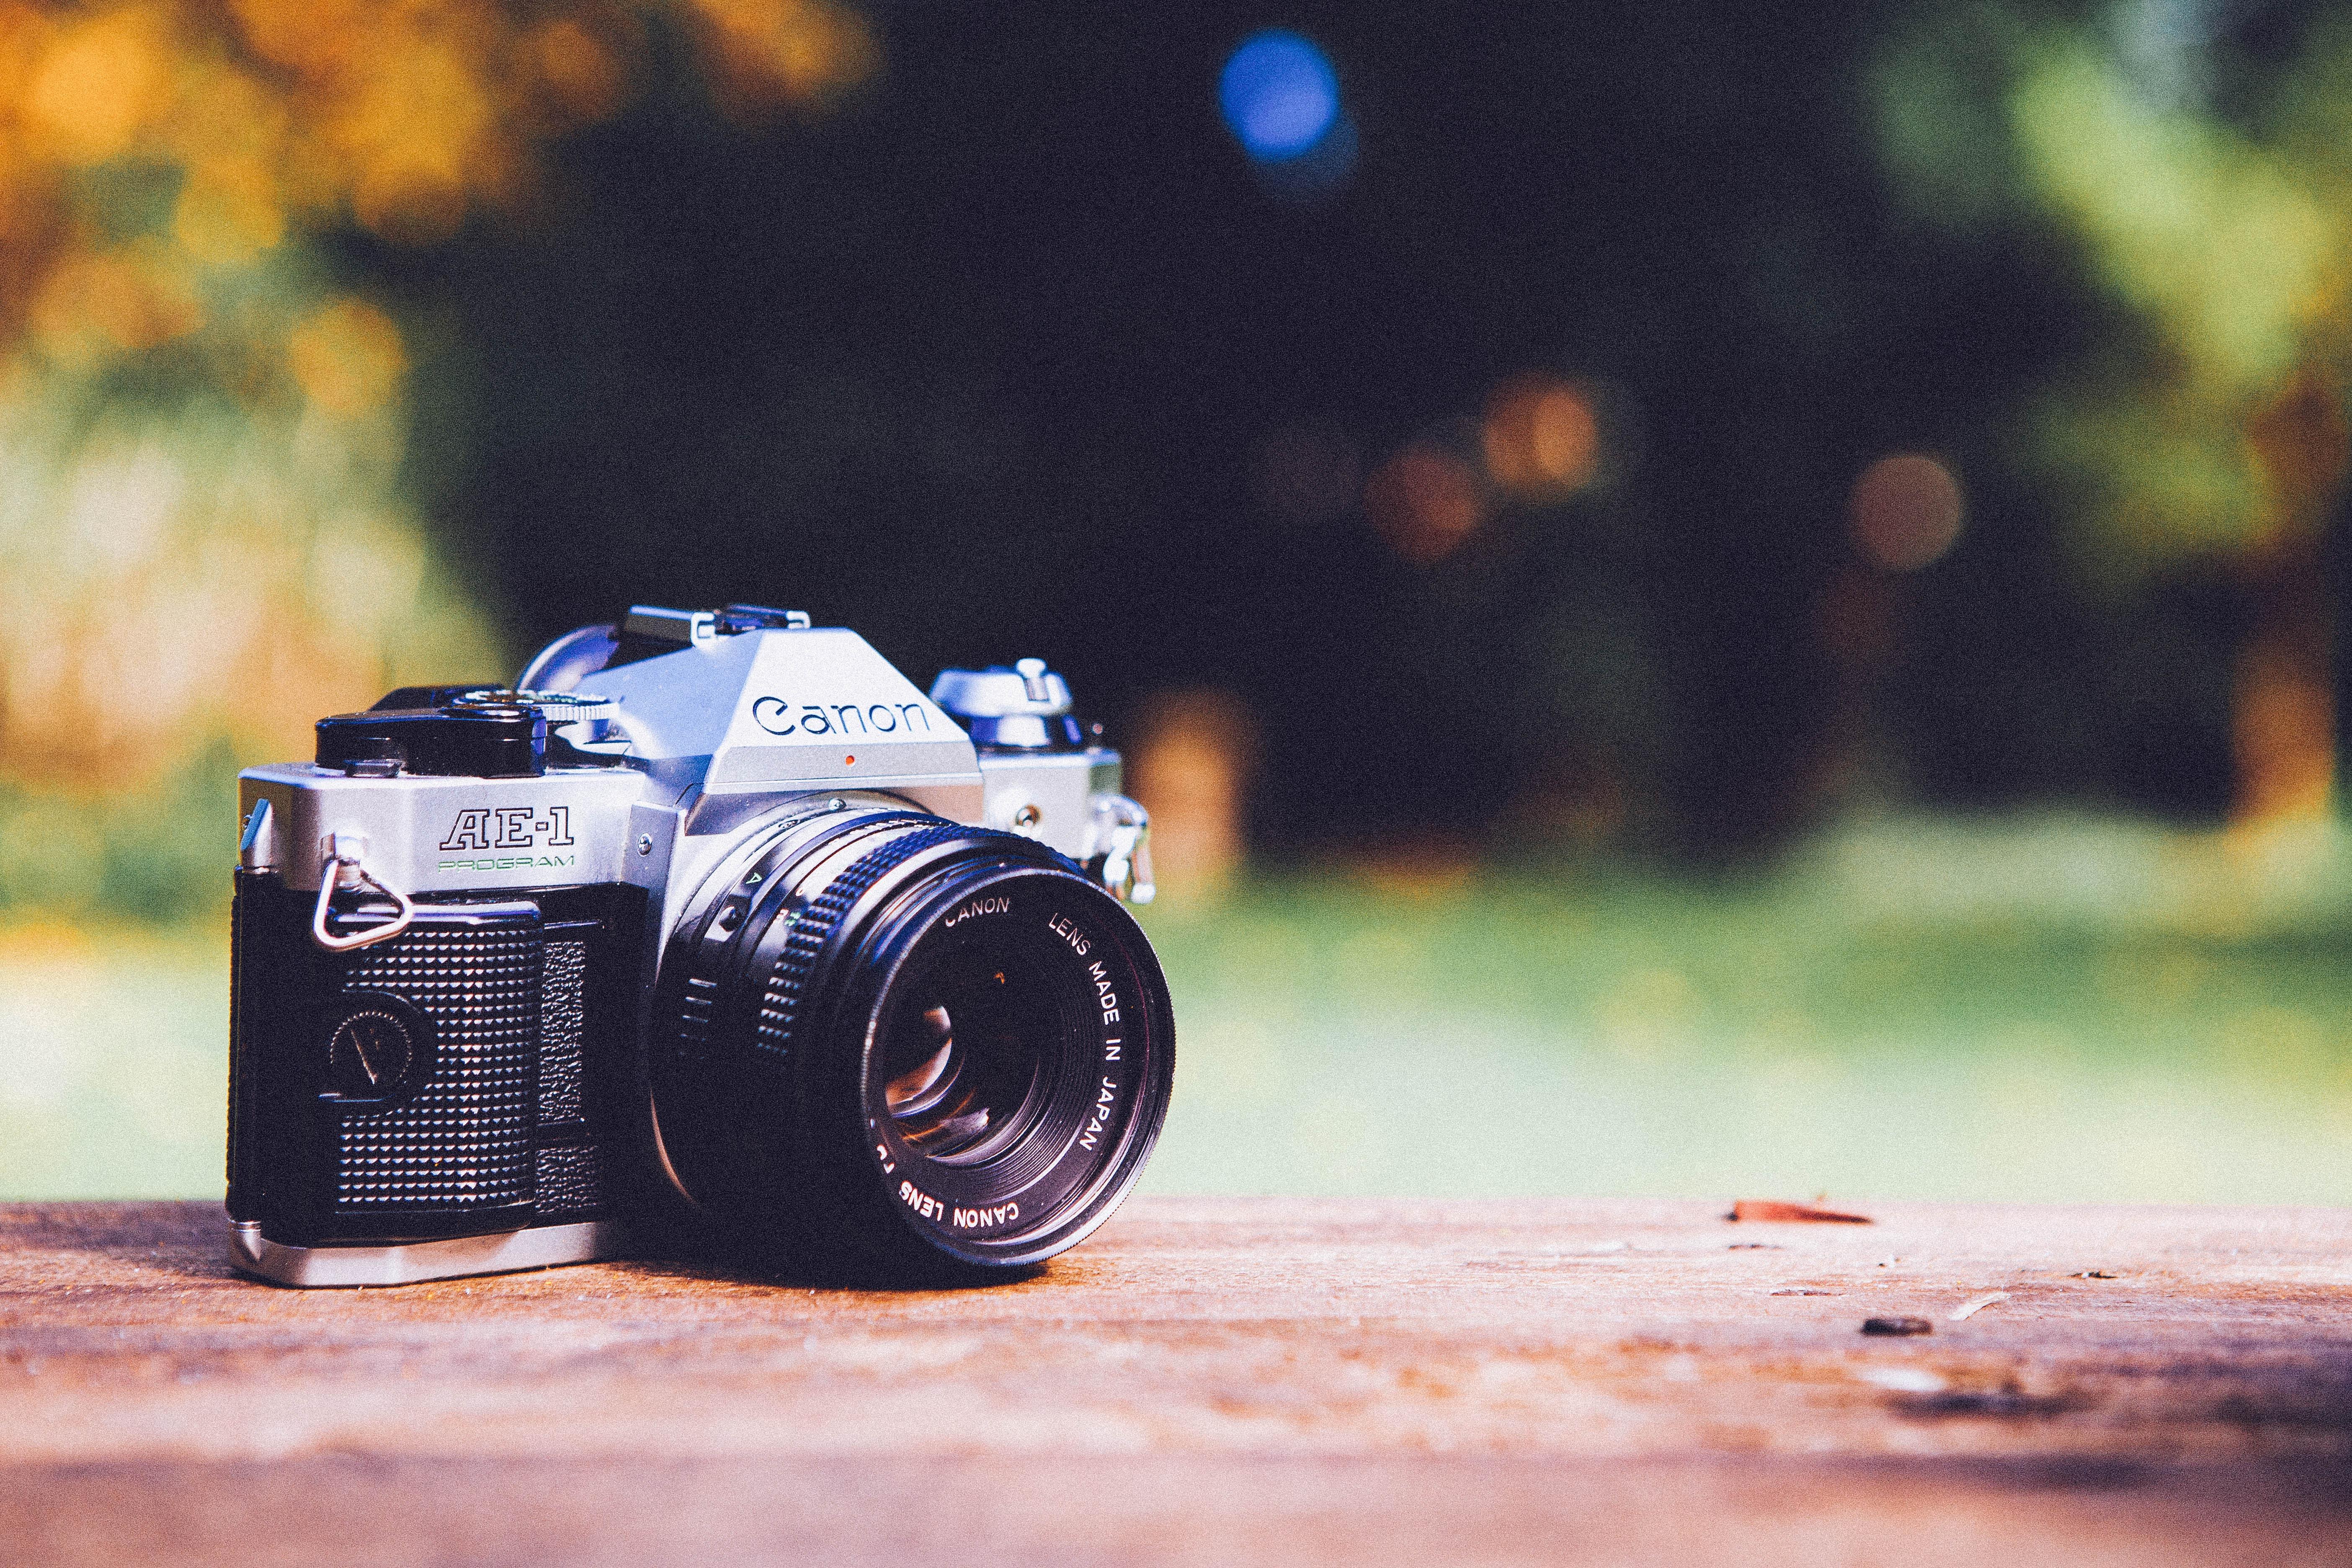 kamera fotografi kendaraan kamera refleks kamera digital foto kamera DSLR slr digital Kamera SLR digital tunggal